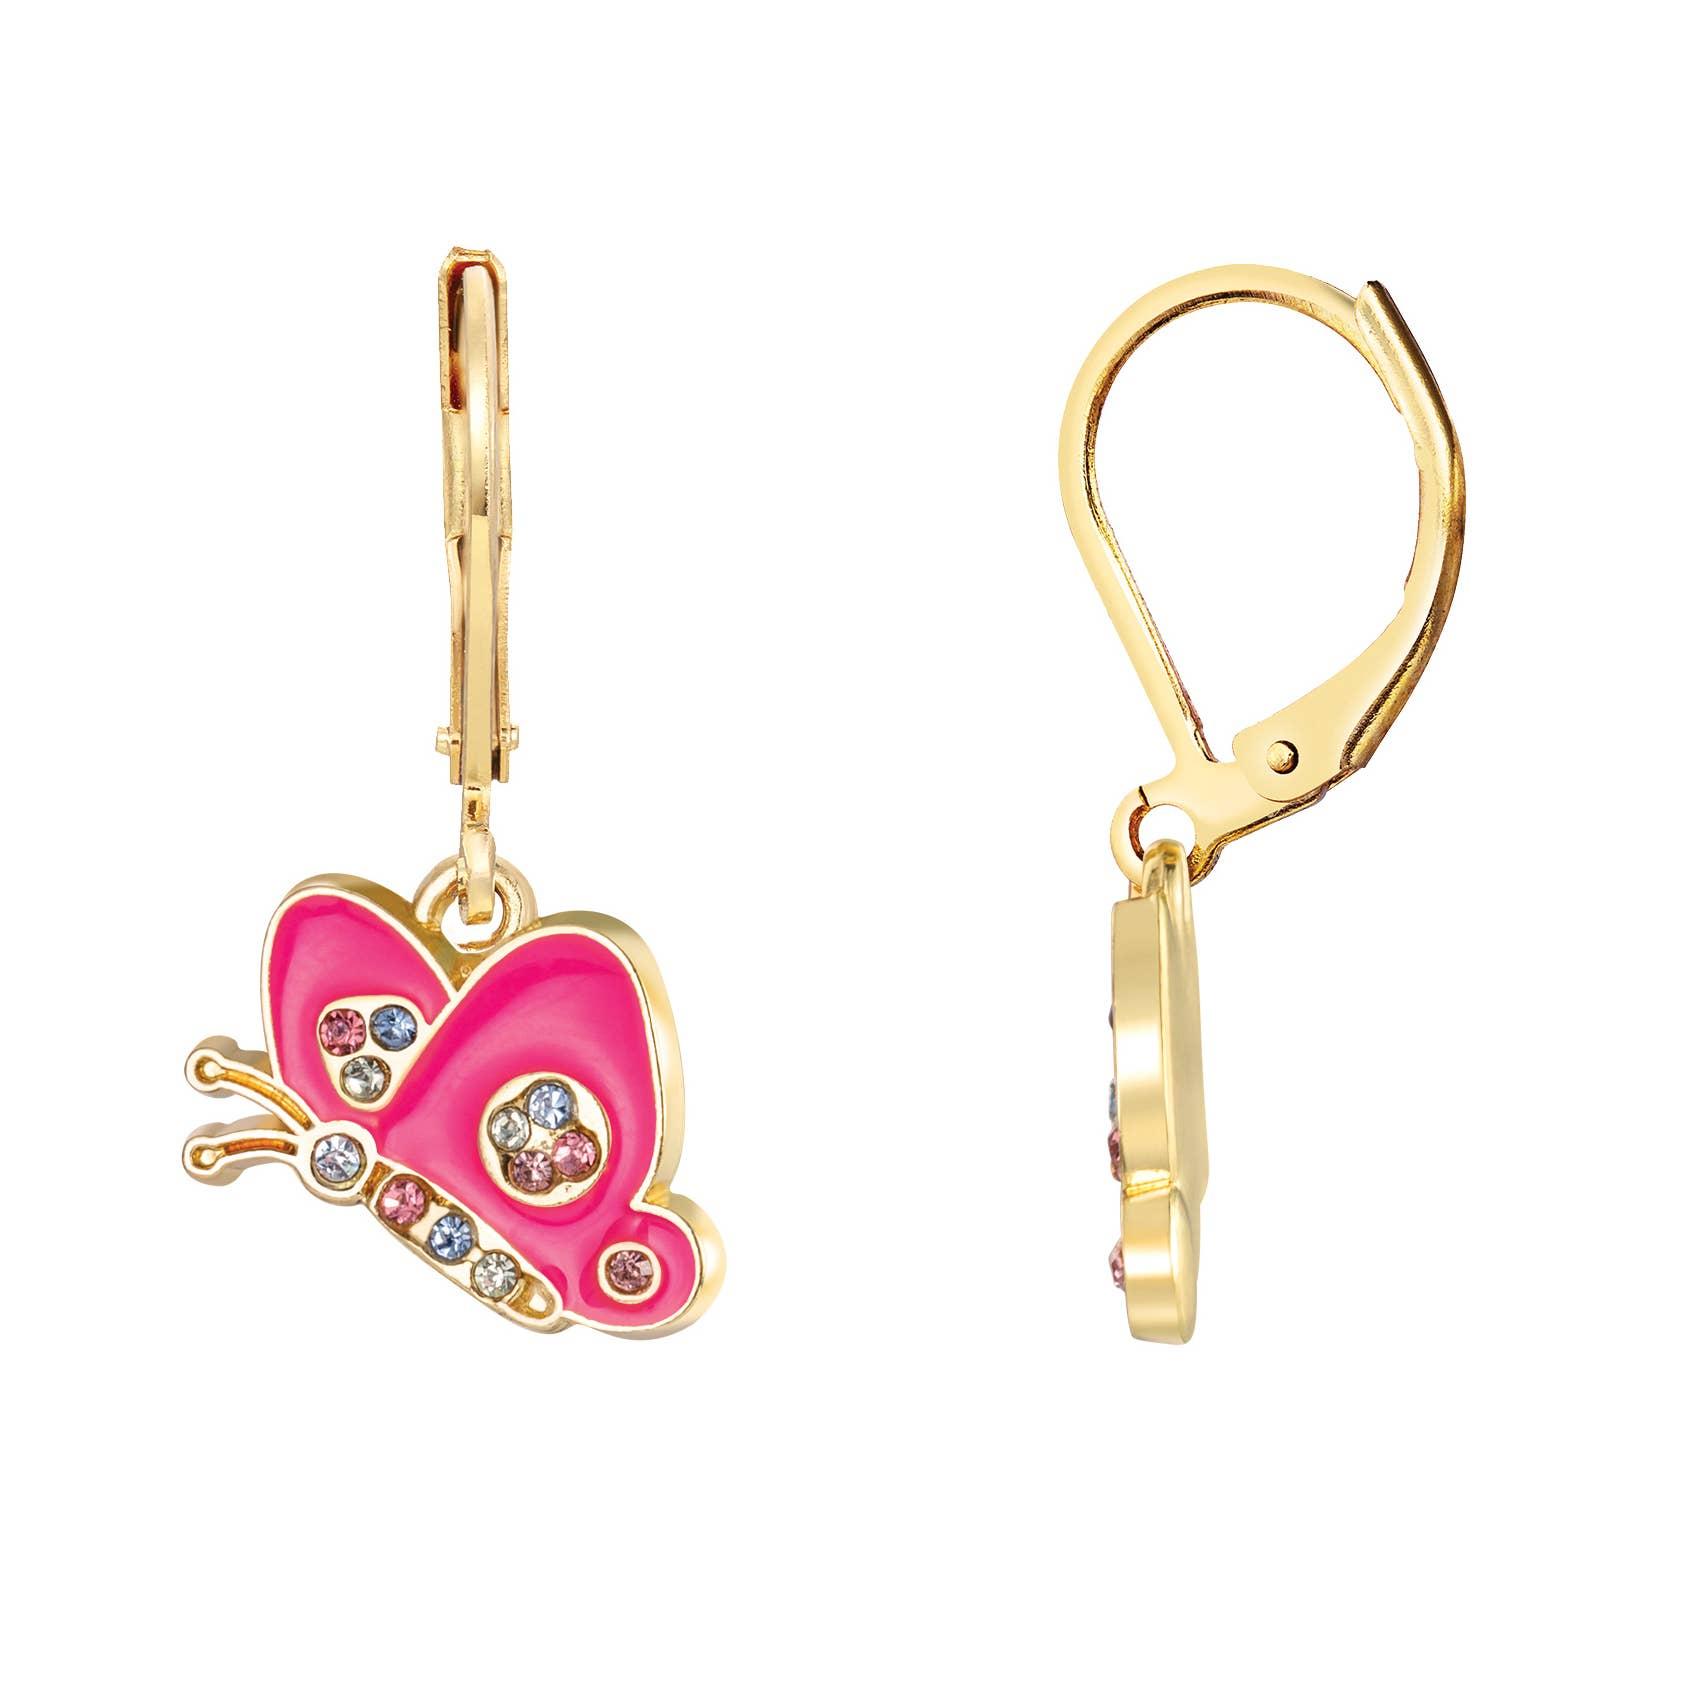 Crystal Butterfly Lever Back Earrings | Trada Marketplace